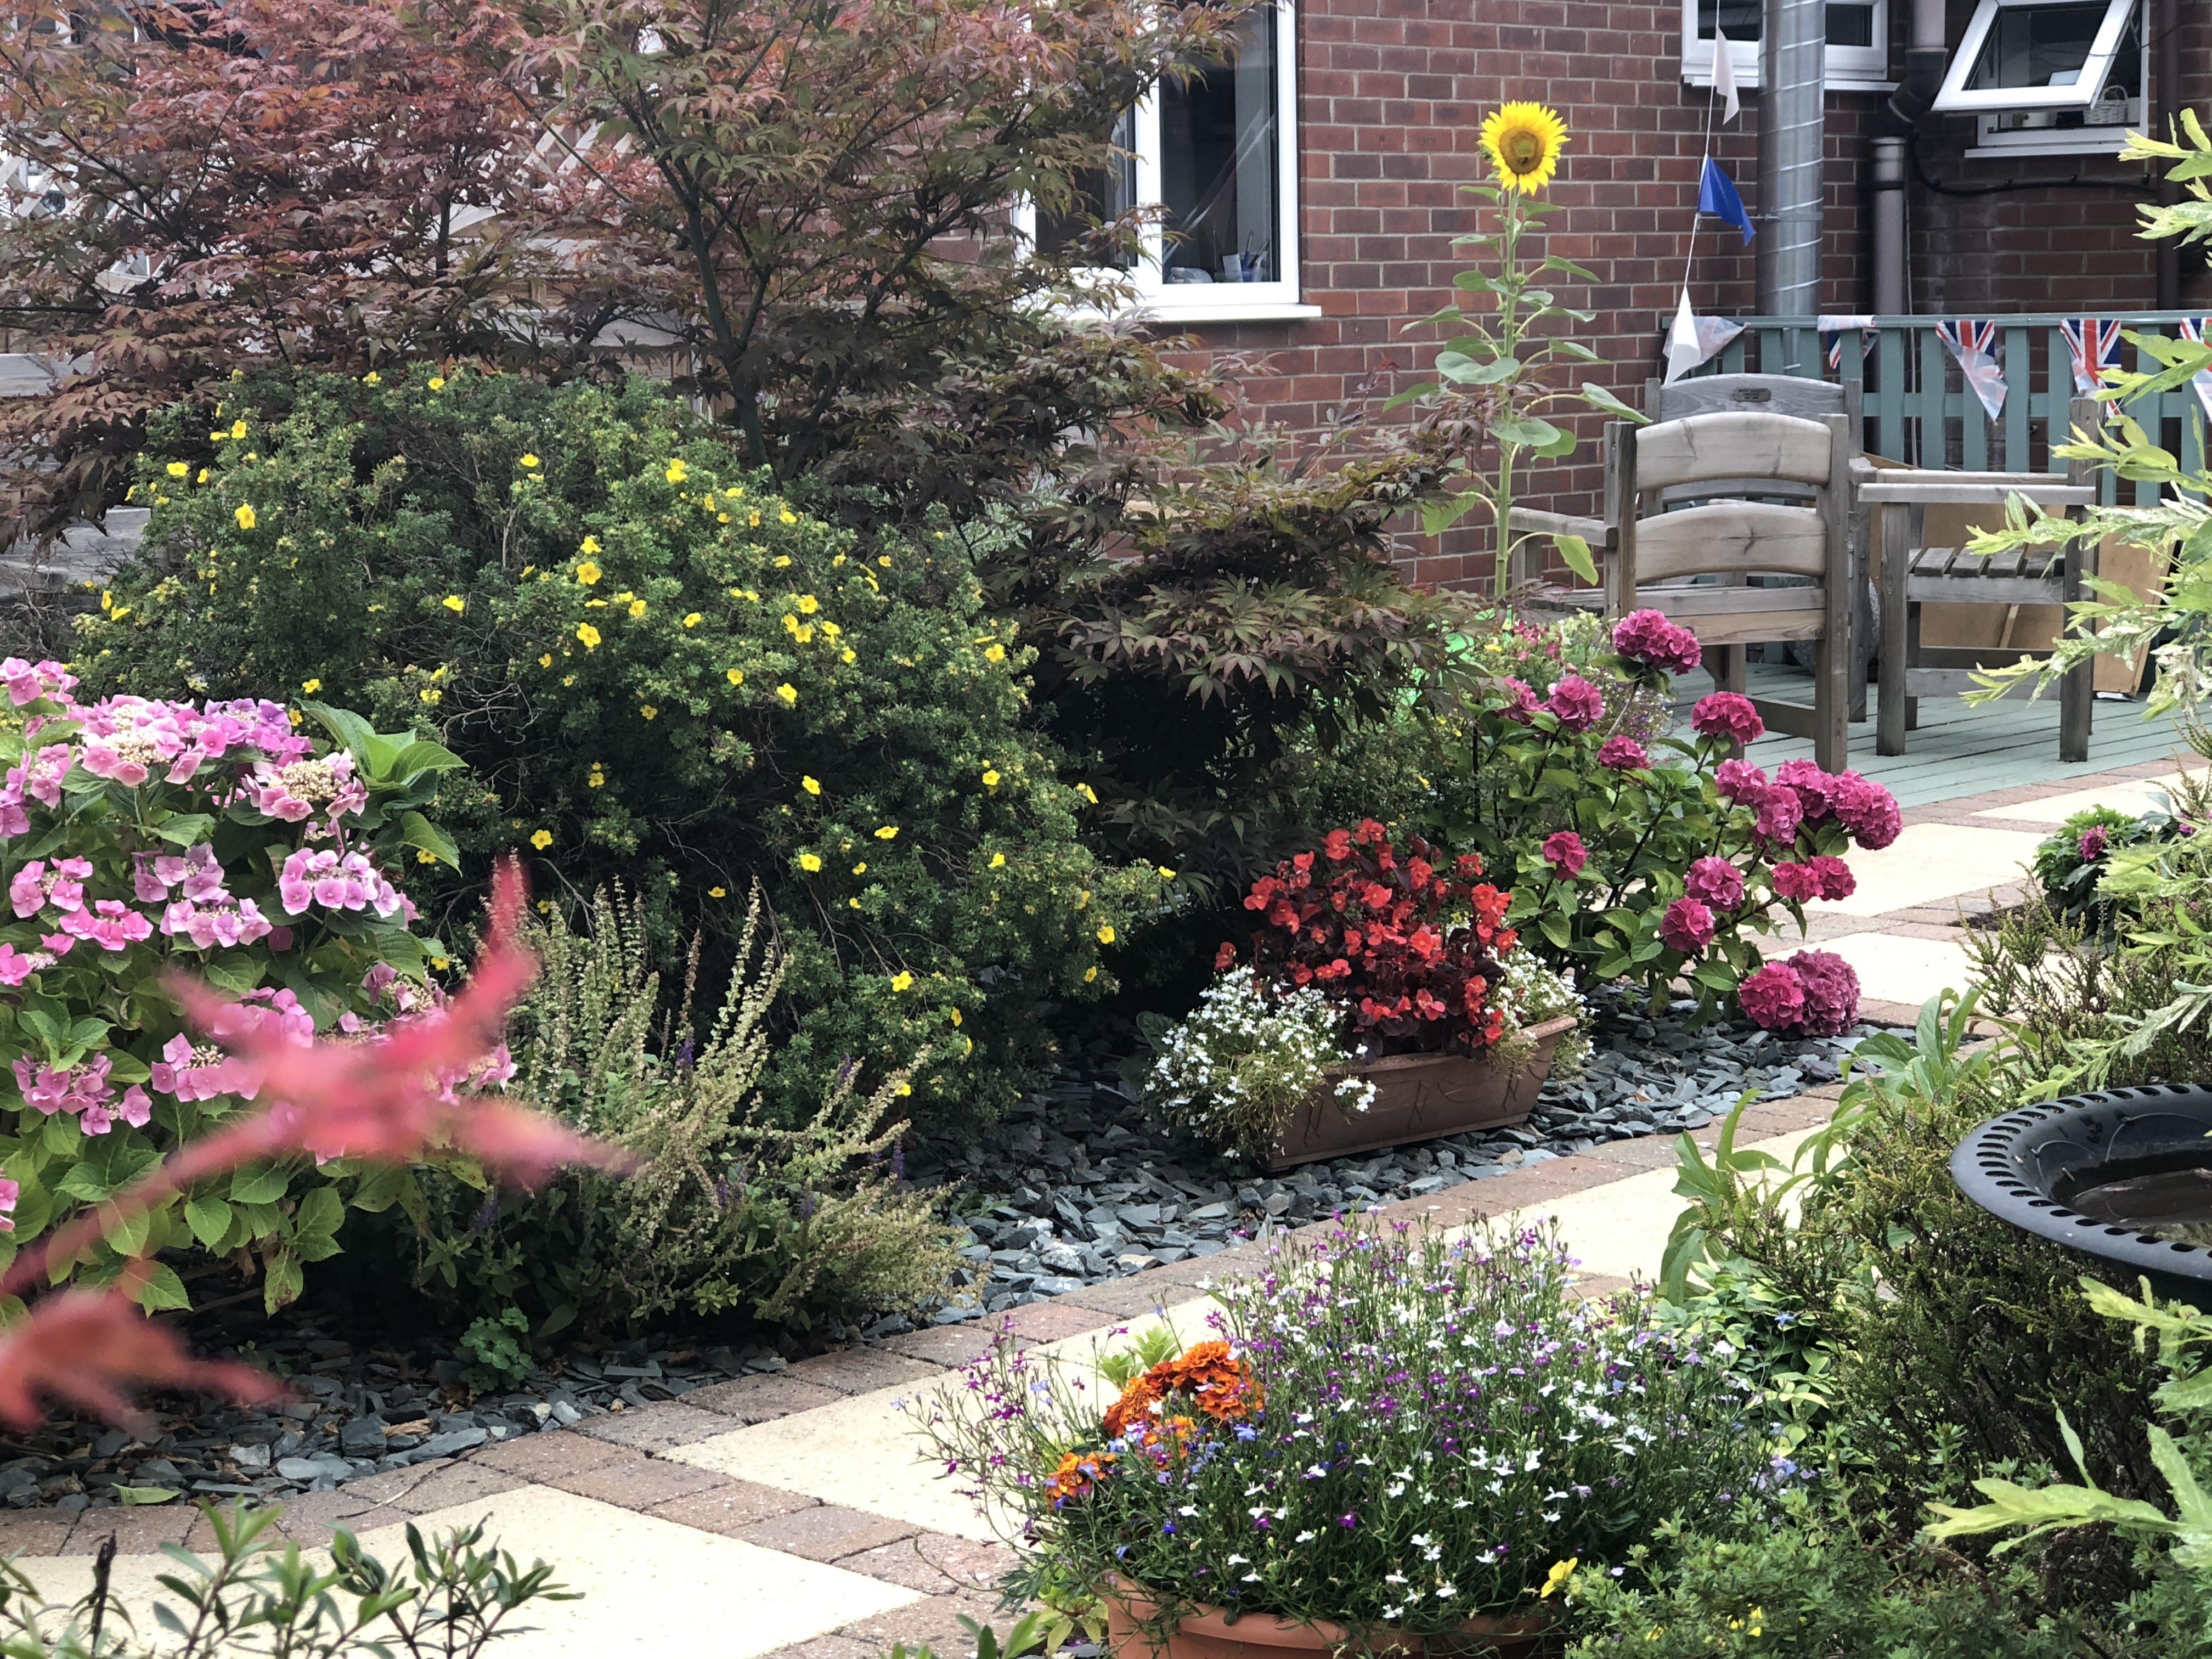 Private garden - Strensall Day Care Centre, York